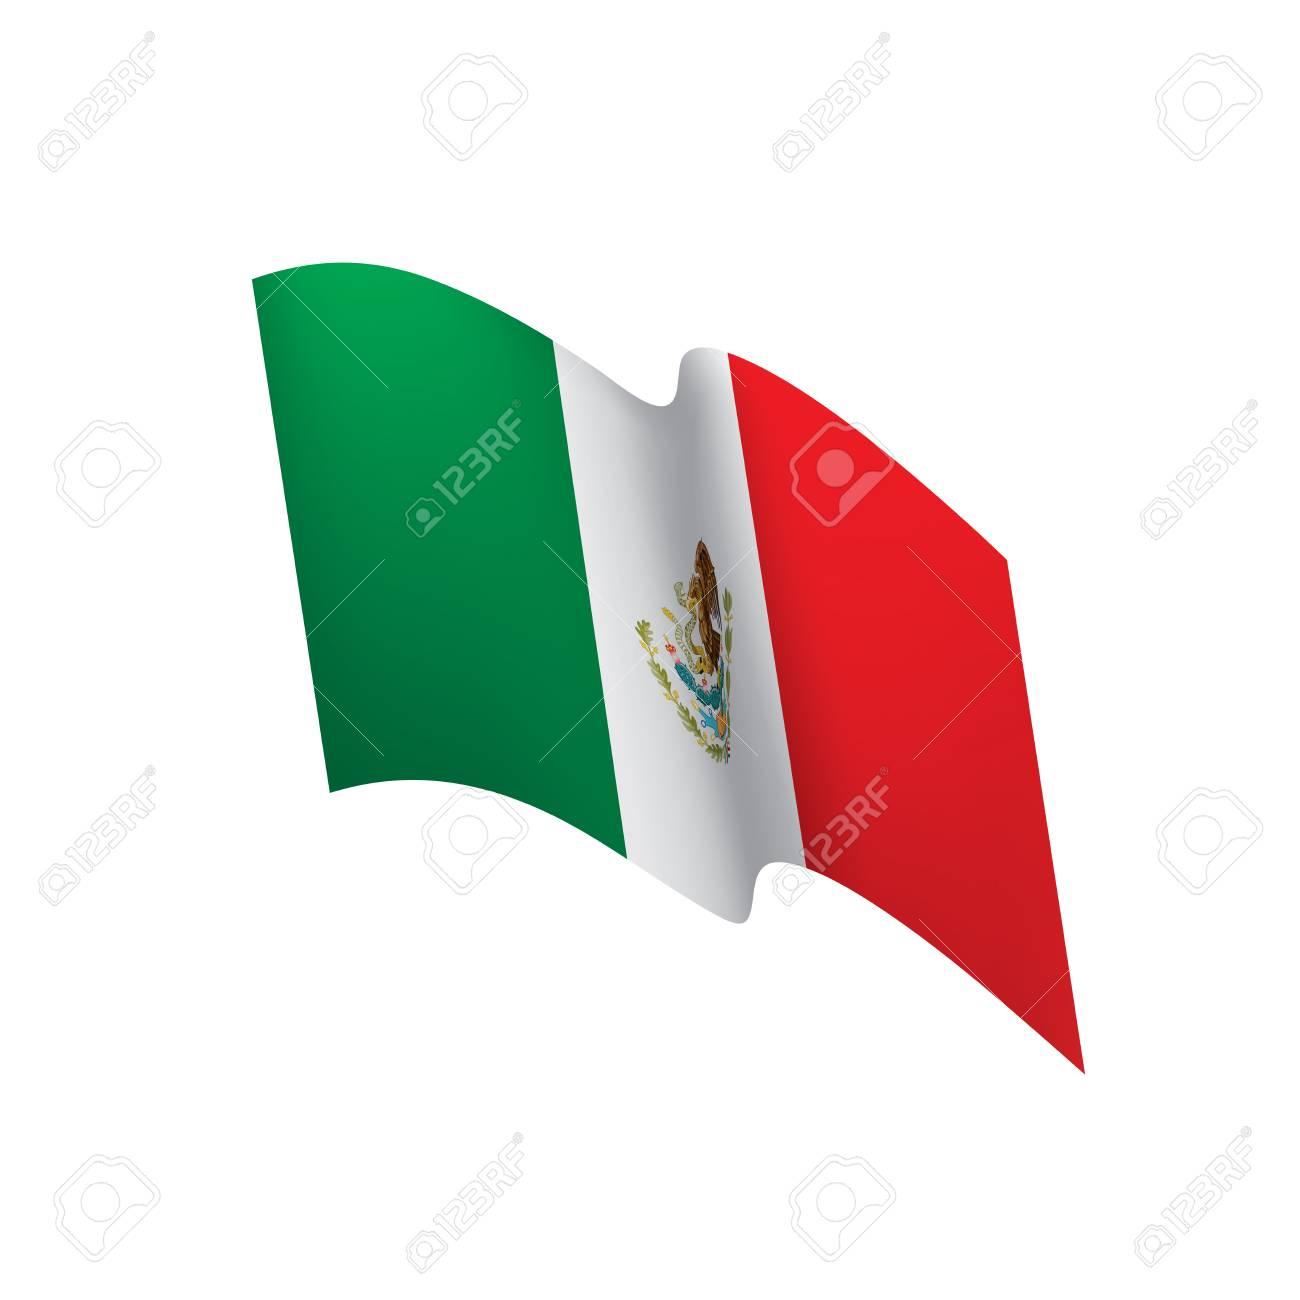 mexican flag vector illustration royalty free cliparts vectors rh 123rf com mexican flag vector image mexican flag logo vector